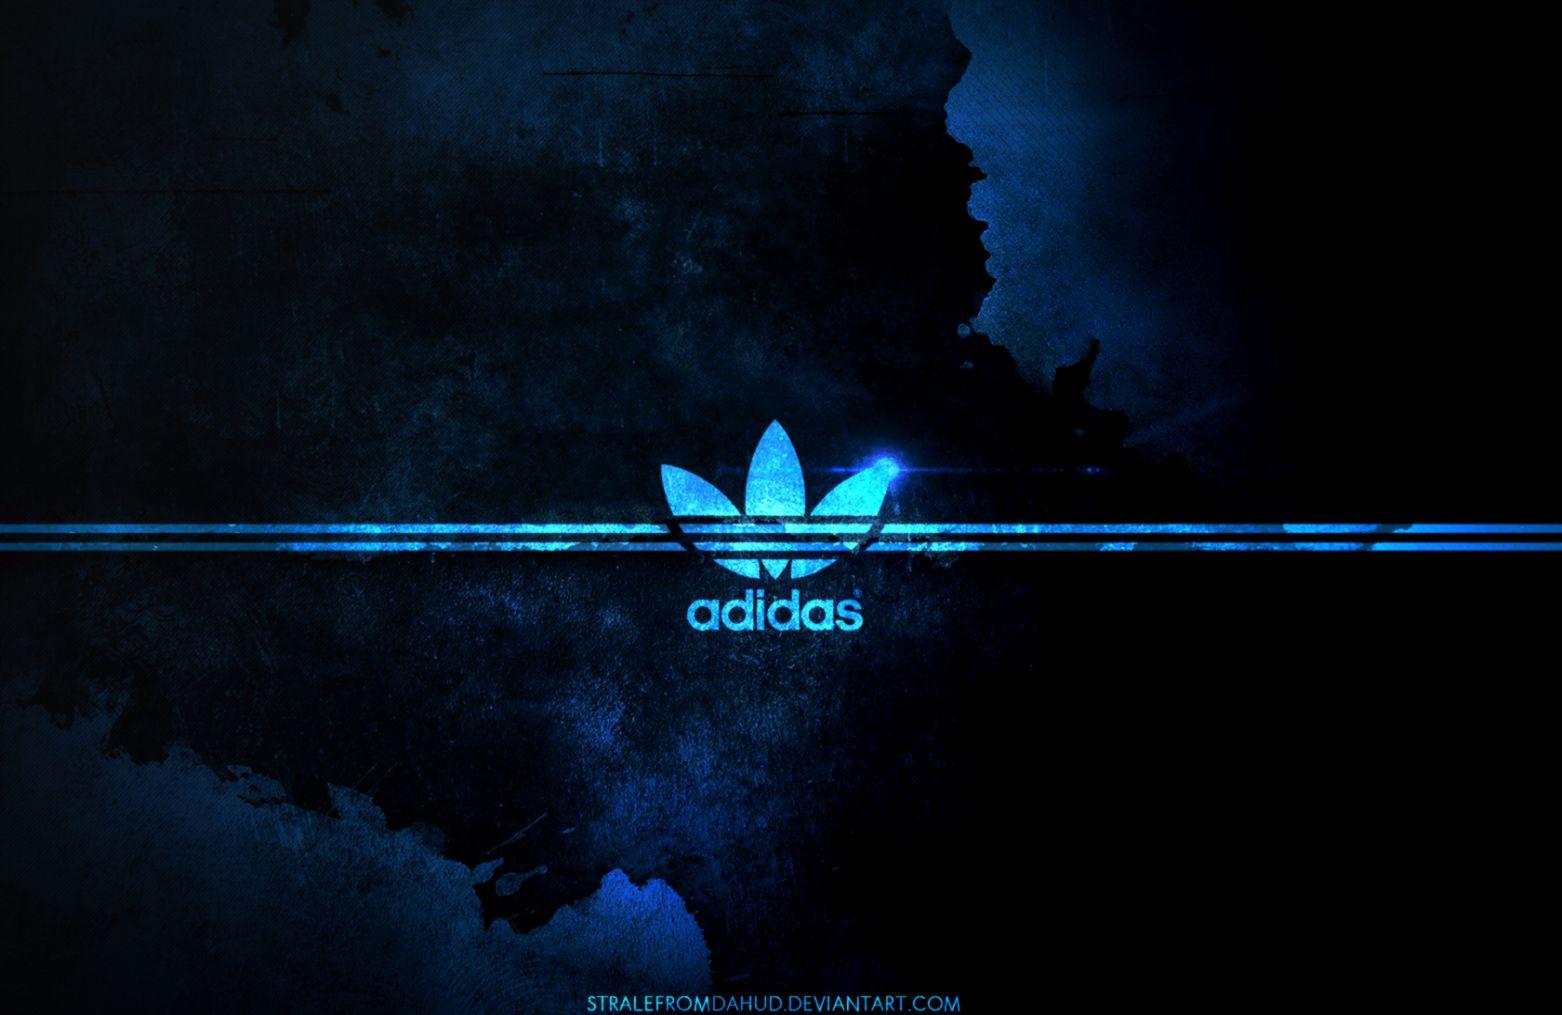 Adidas Football Free Wallpaper Hd Downloads Wallpapers